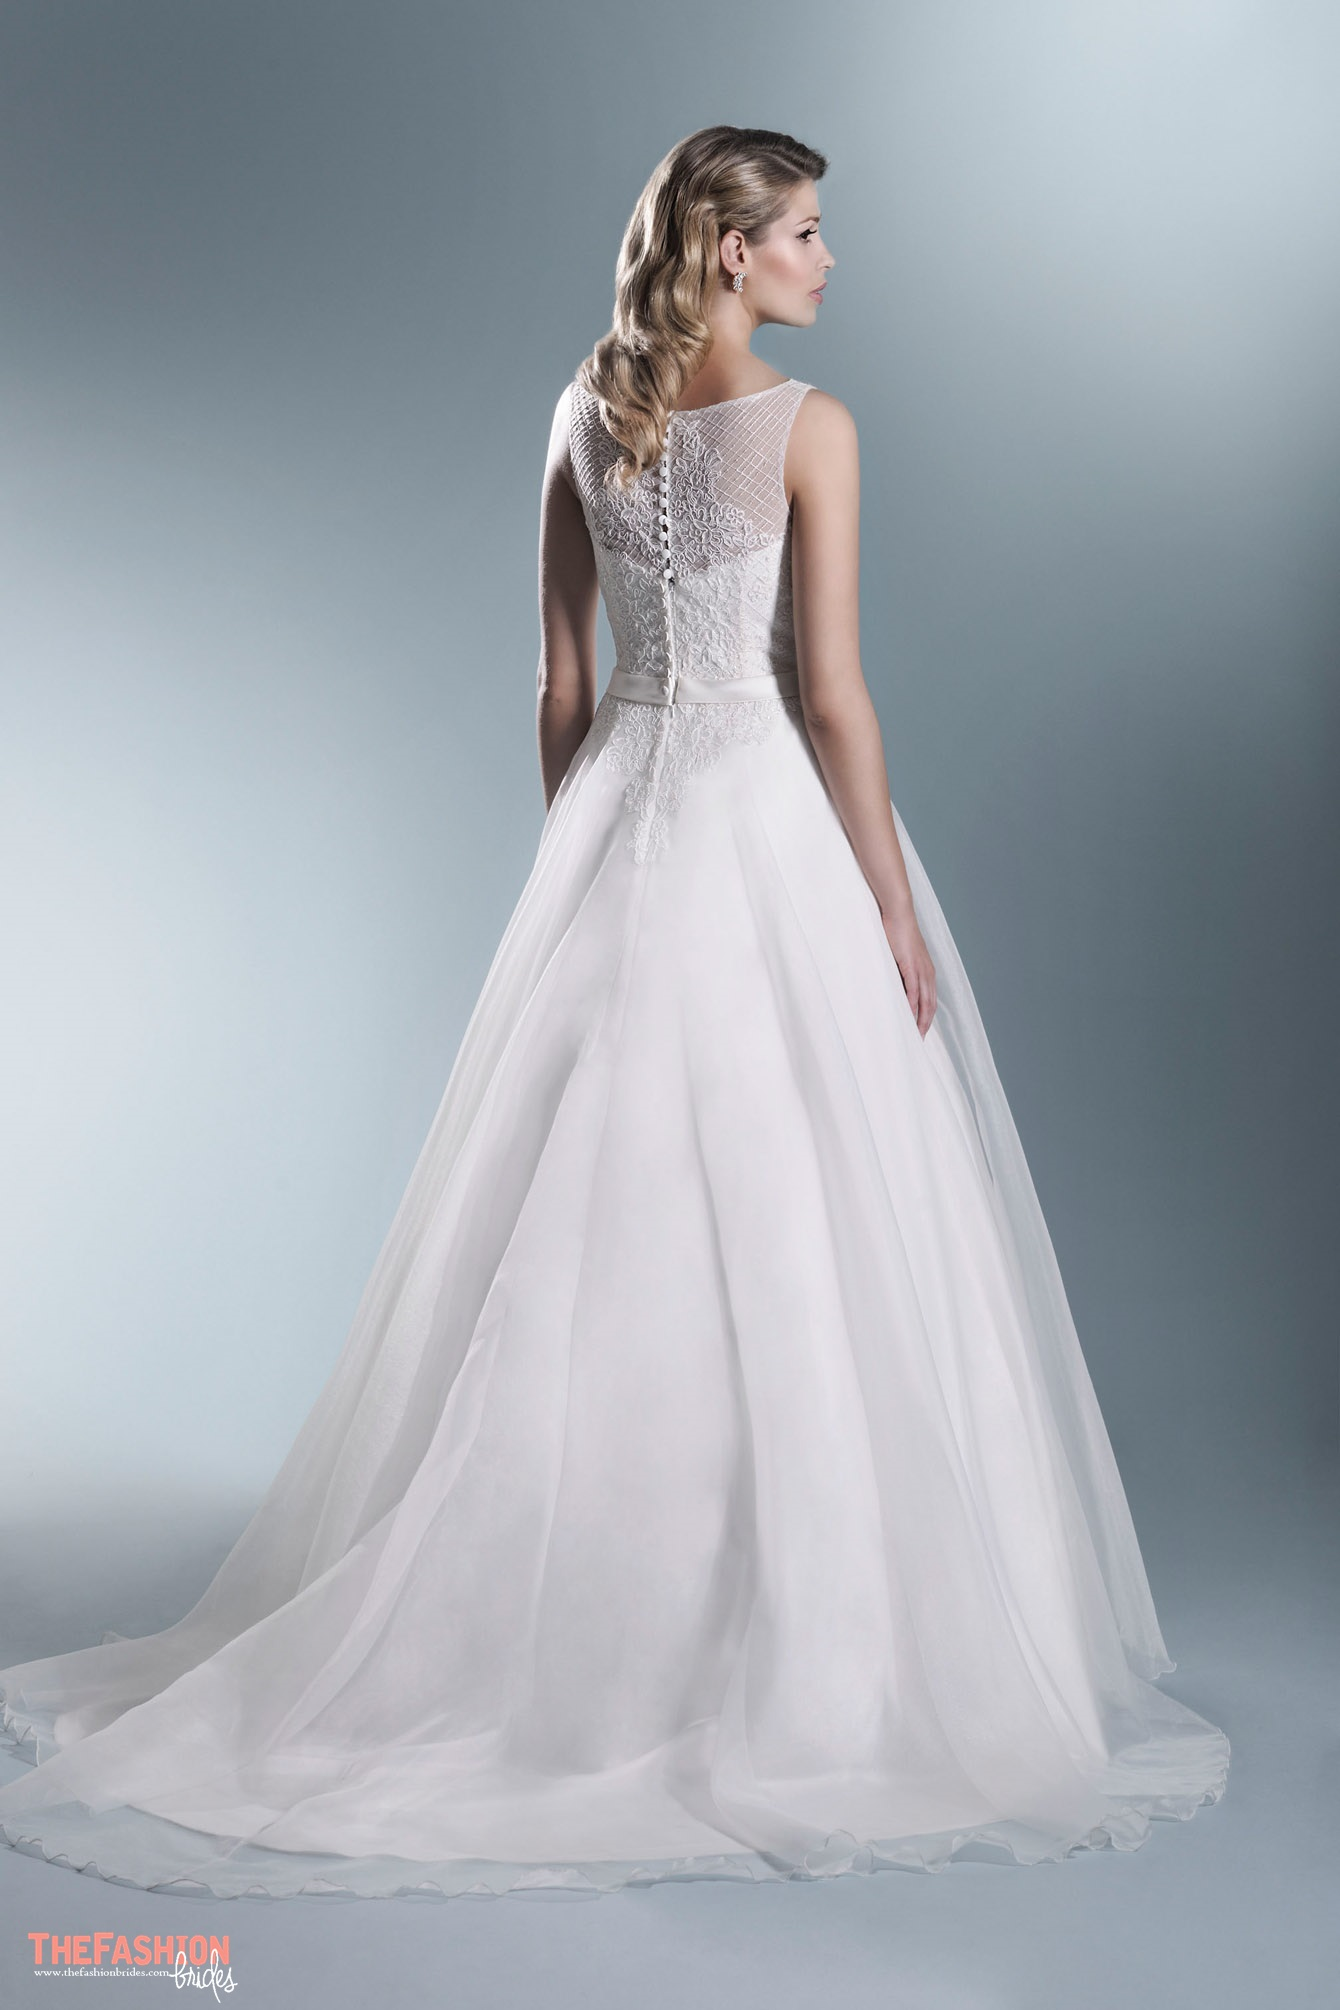 Magnificent Princess Diary 2 Wedding Dress Illustration - Wedding ...